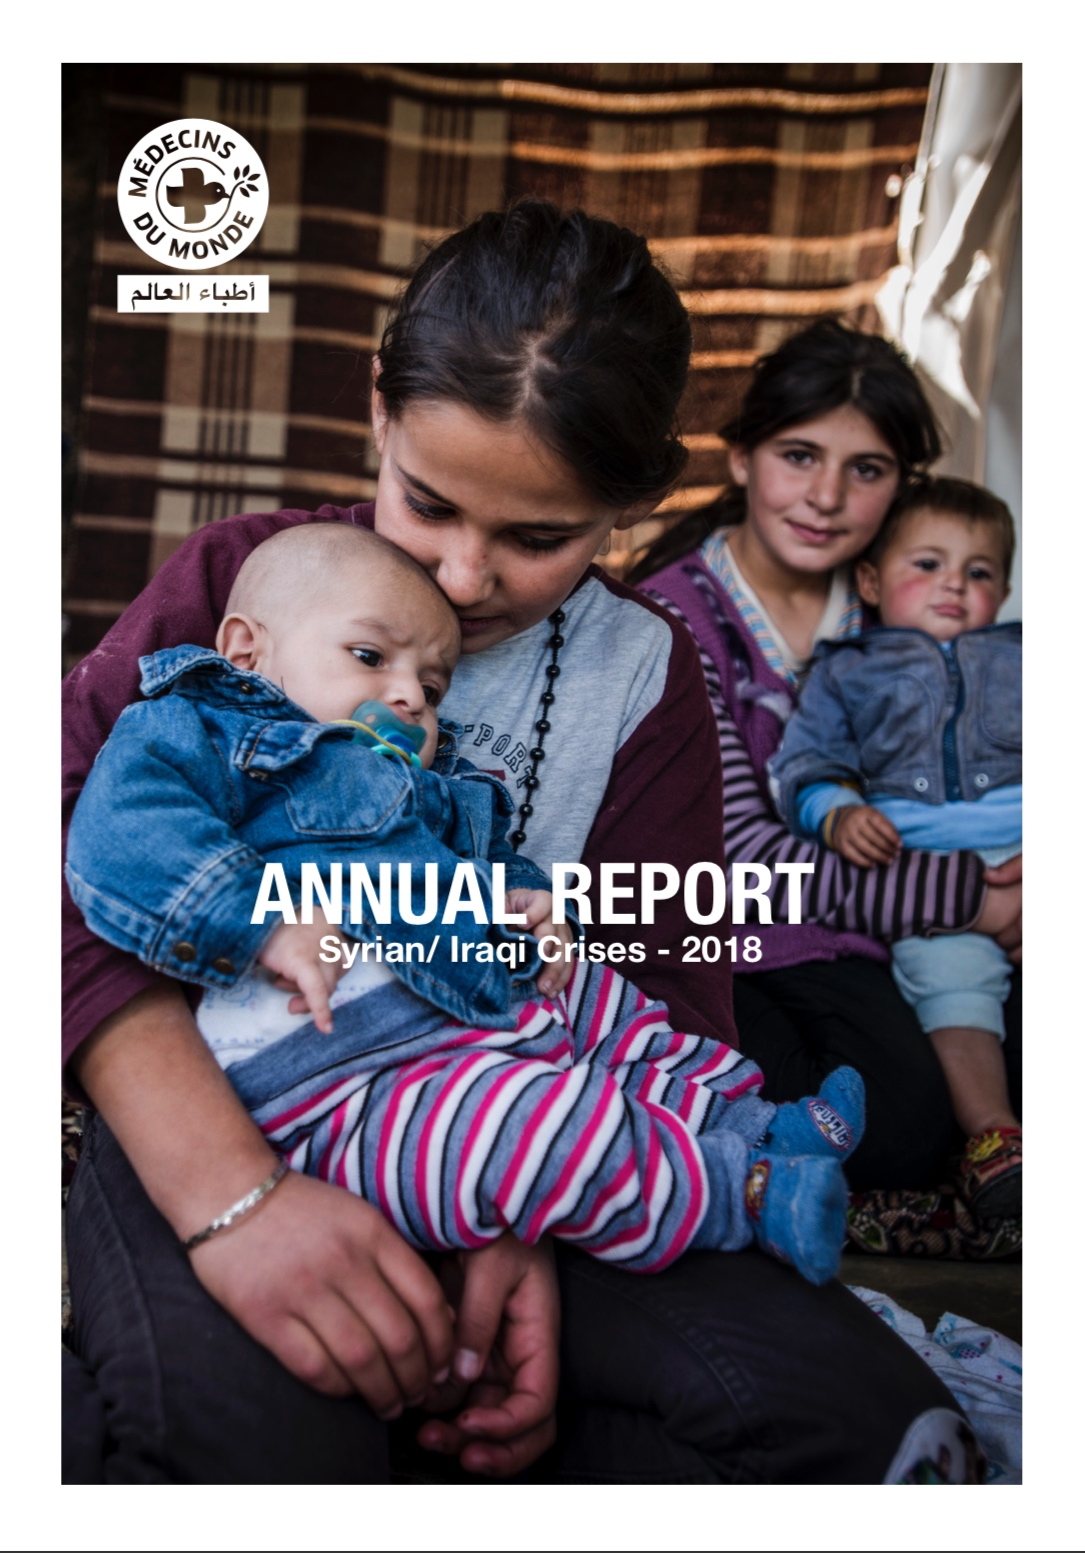 Annual Report: Syrian/ Iraqi Crises 2018